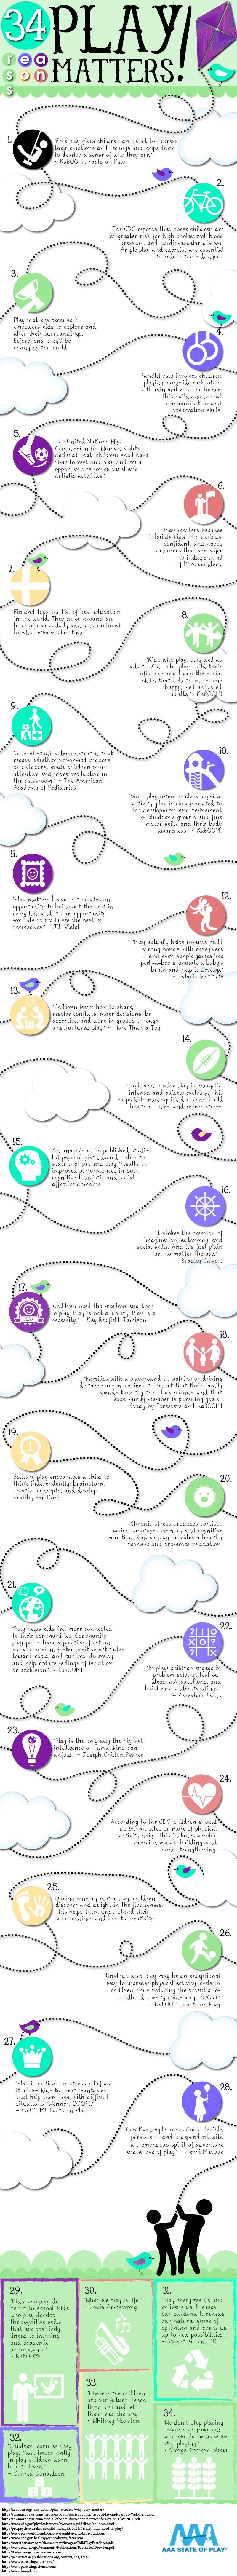 34 reasons play matters